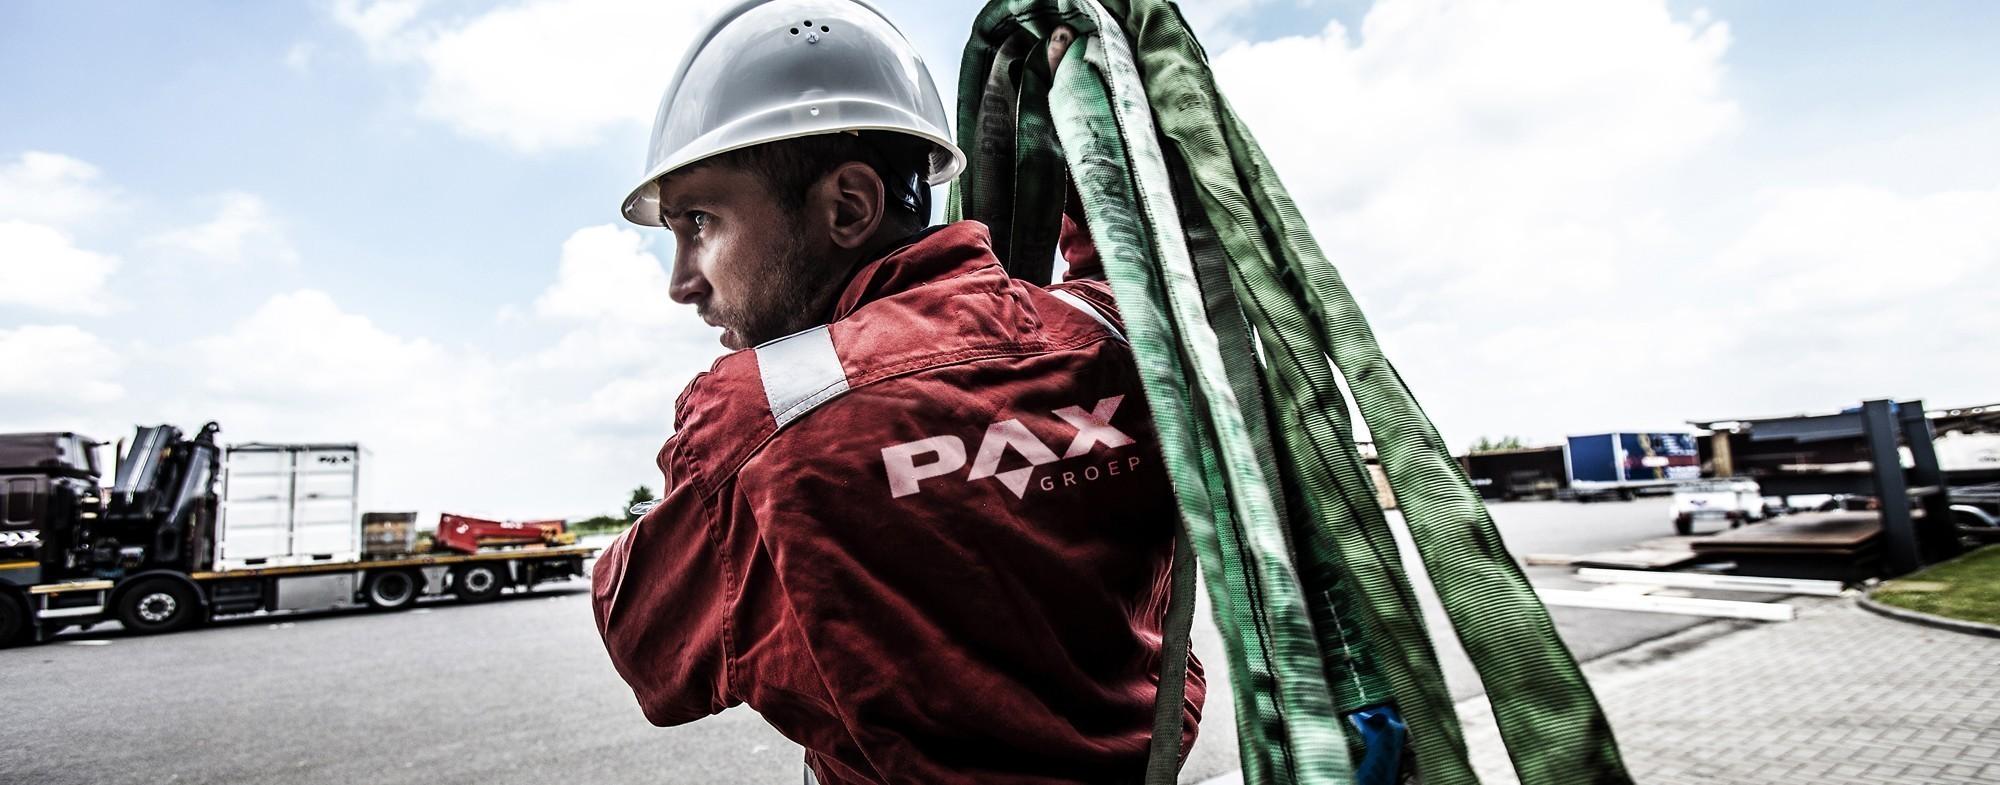 Thijs Postma PAX Groep